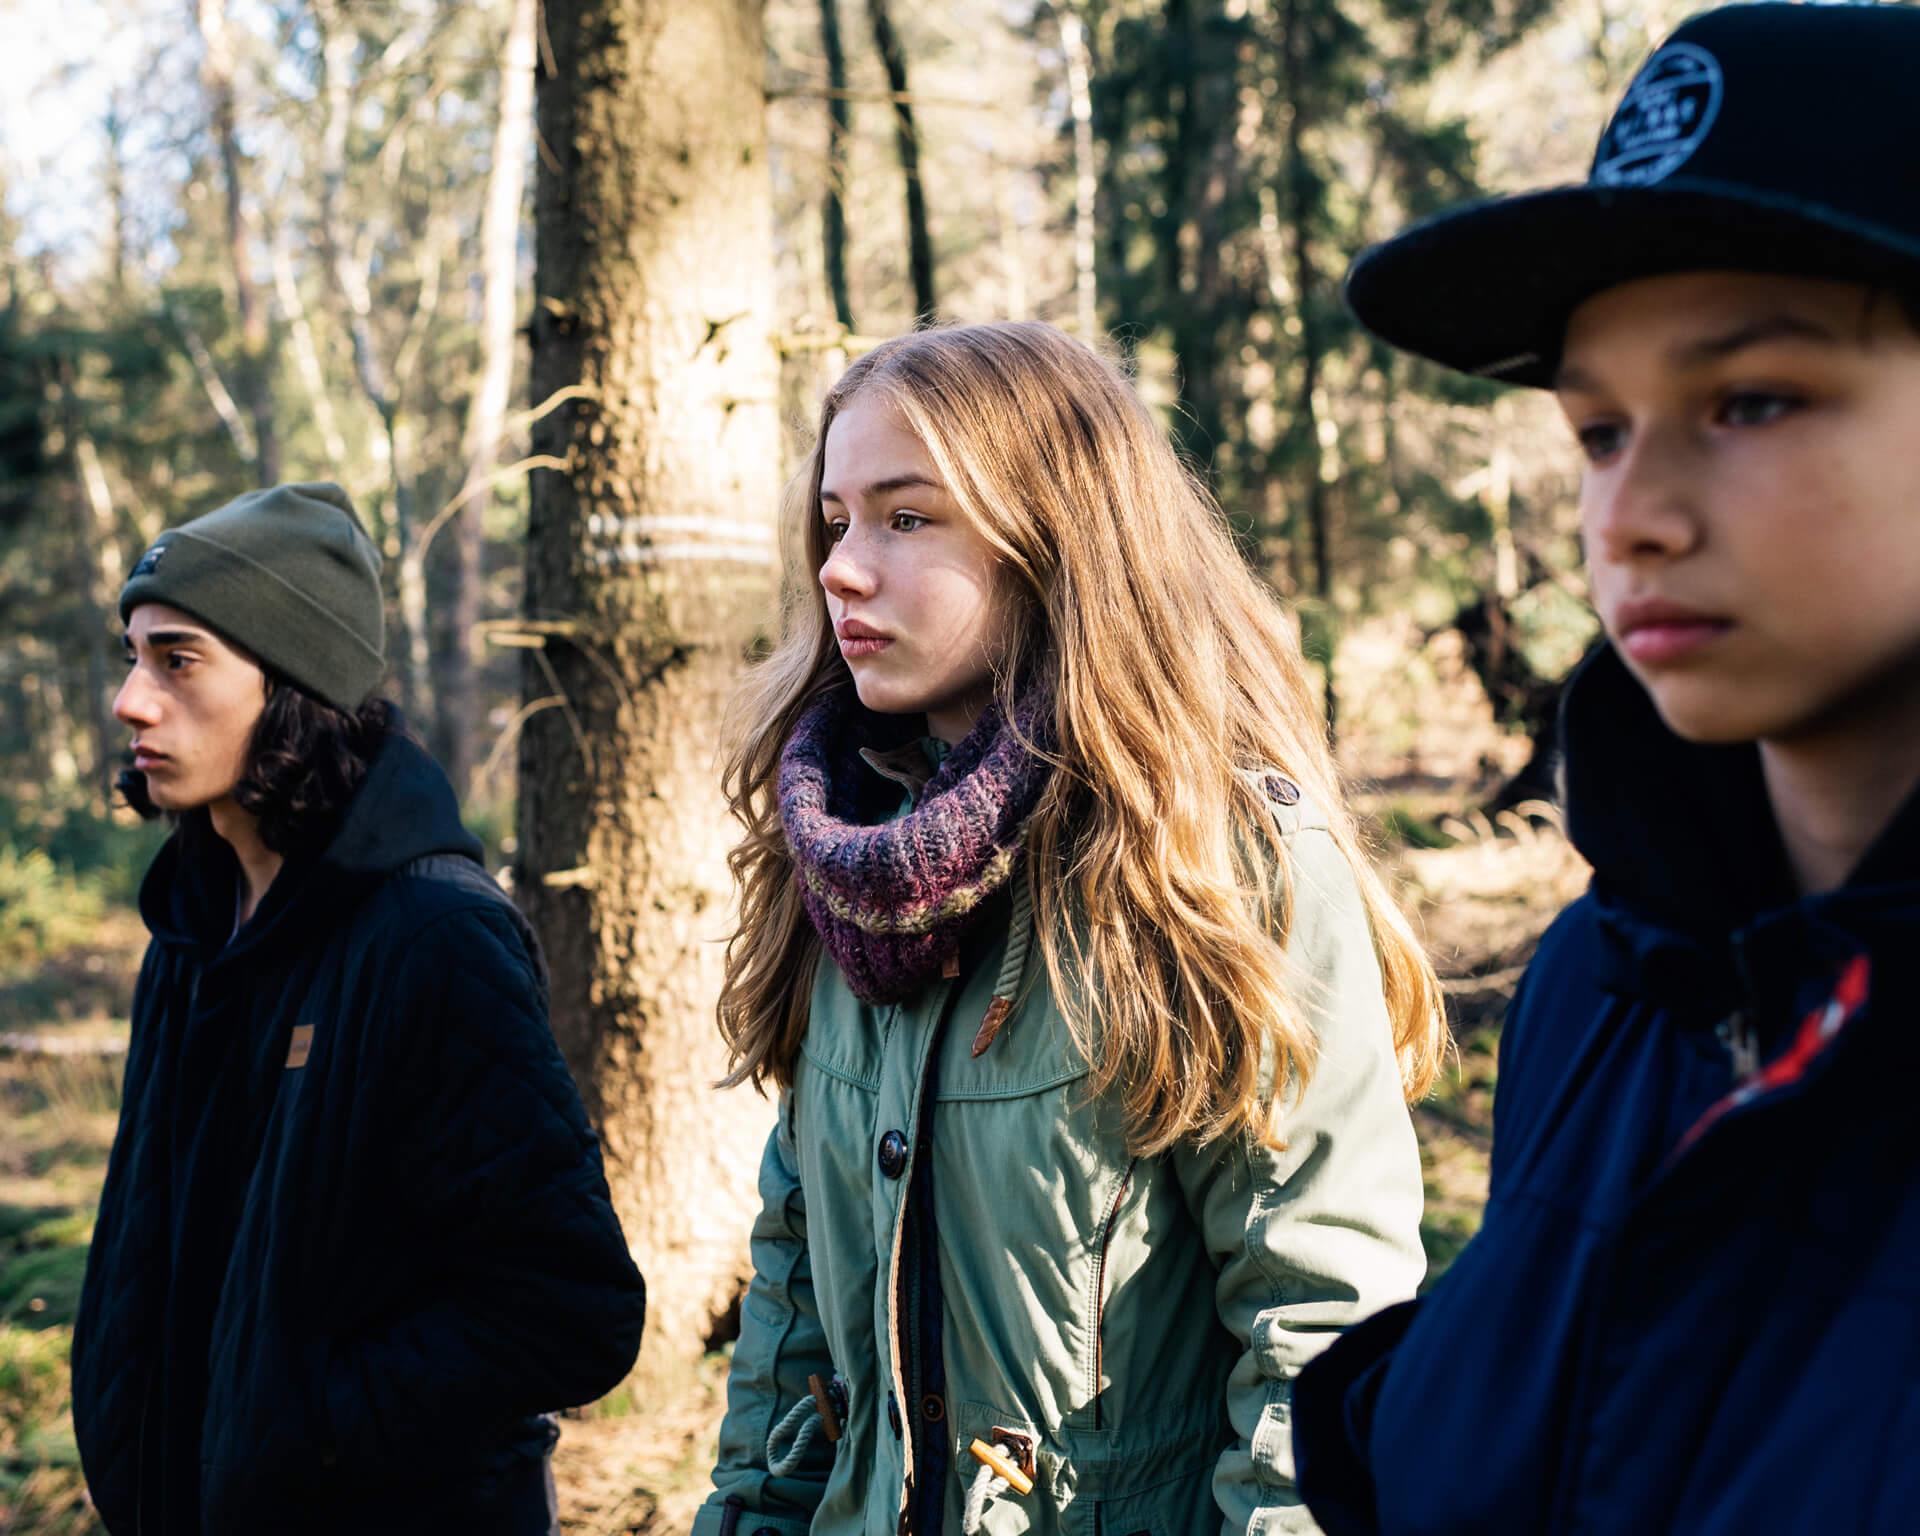 20180218_teens_woodlandwonderland_a_217